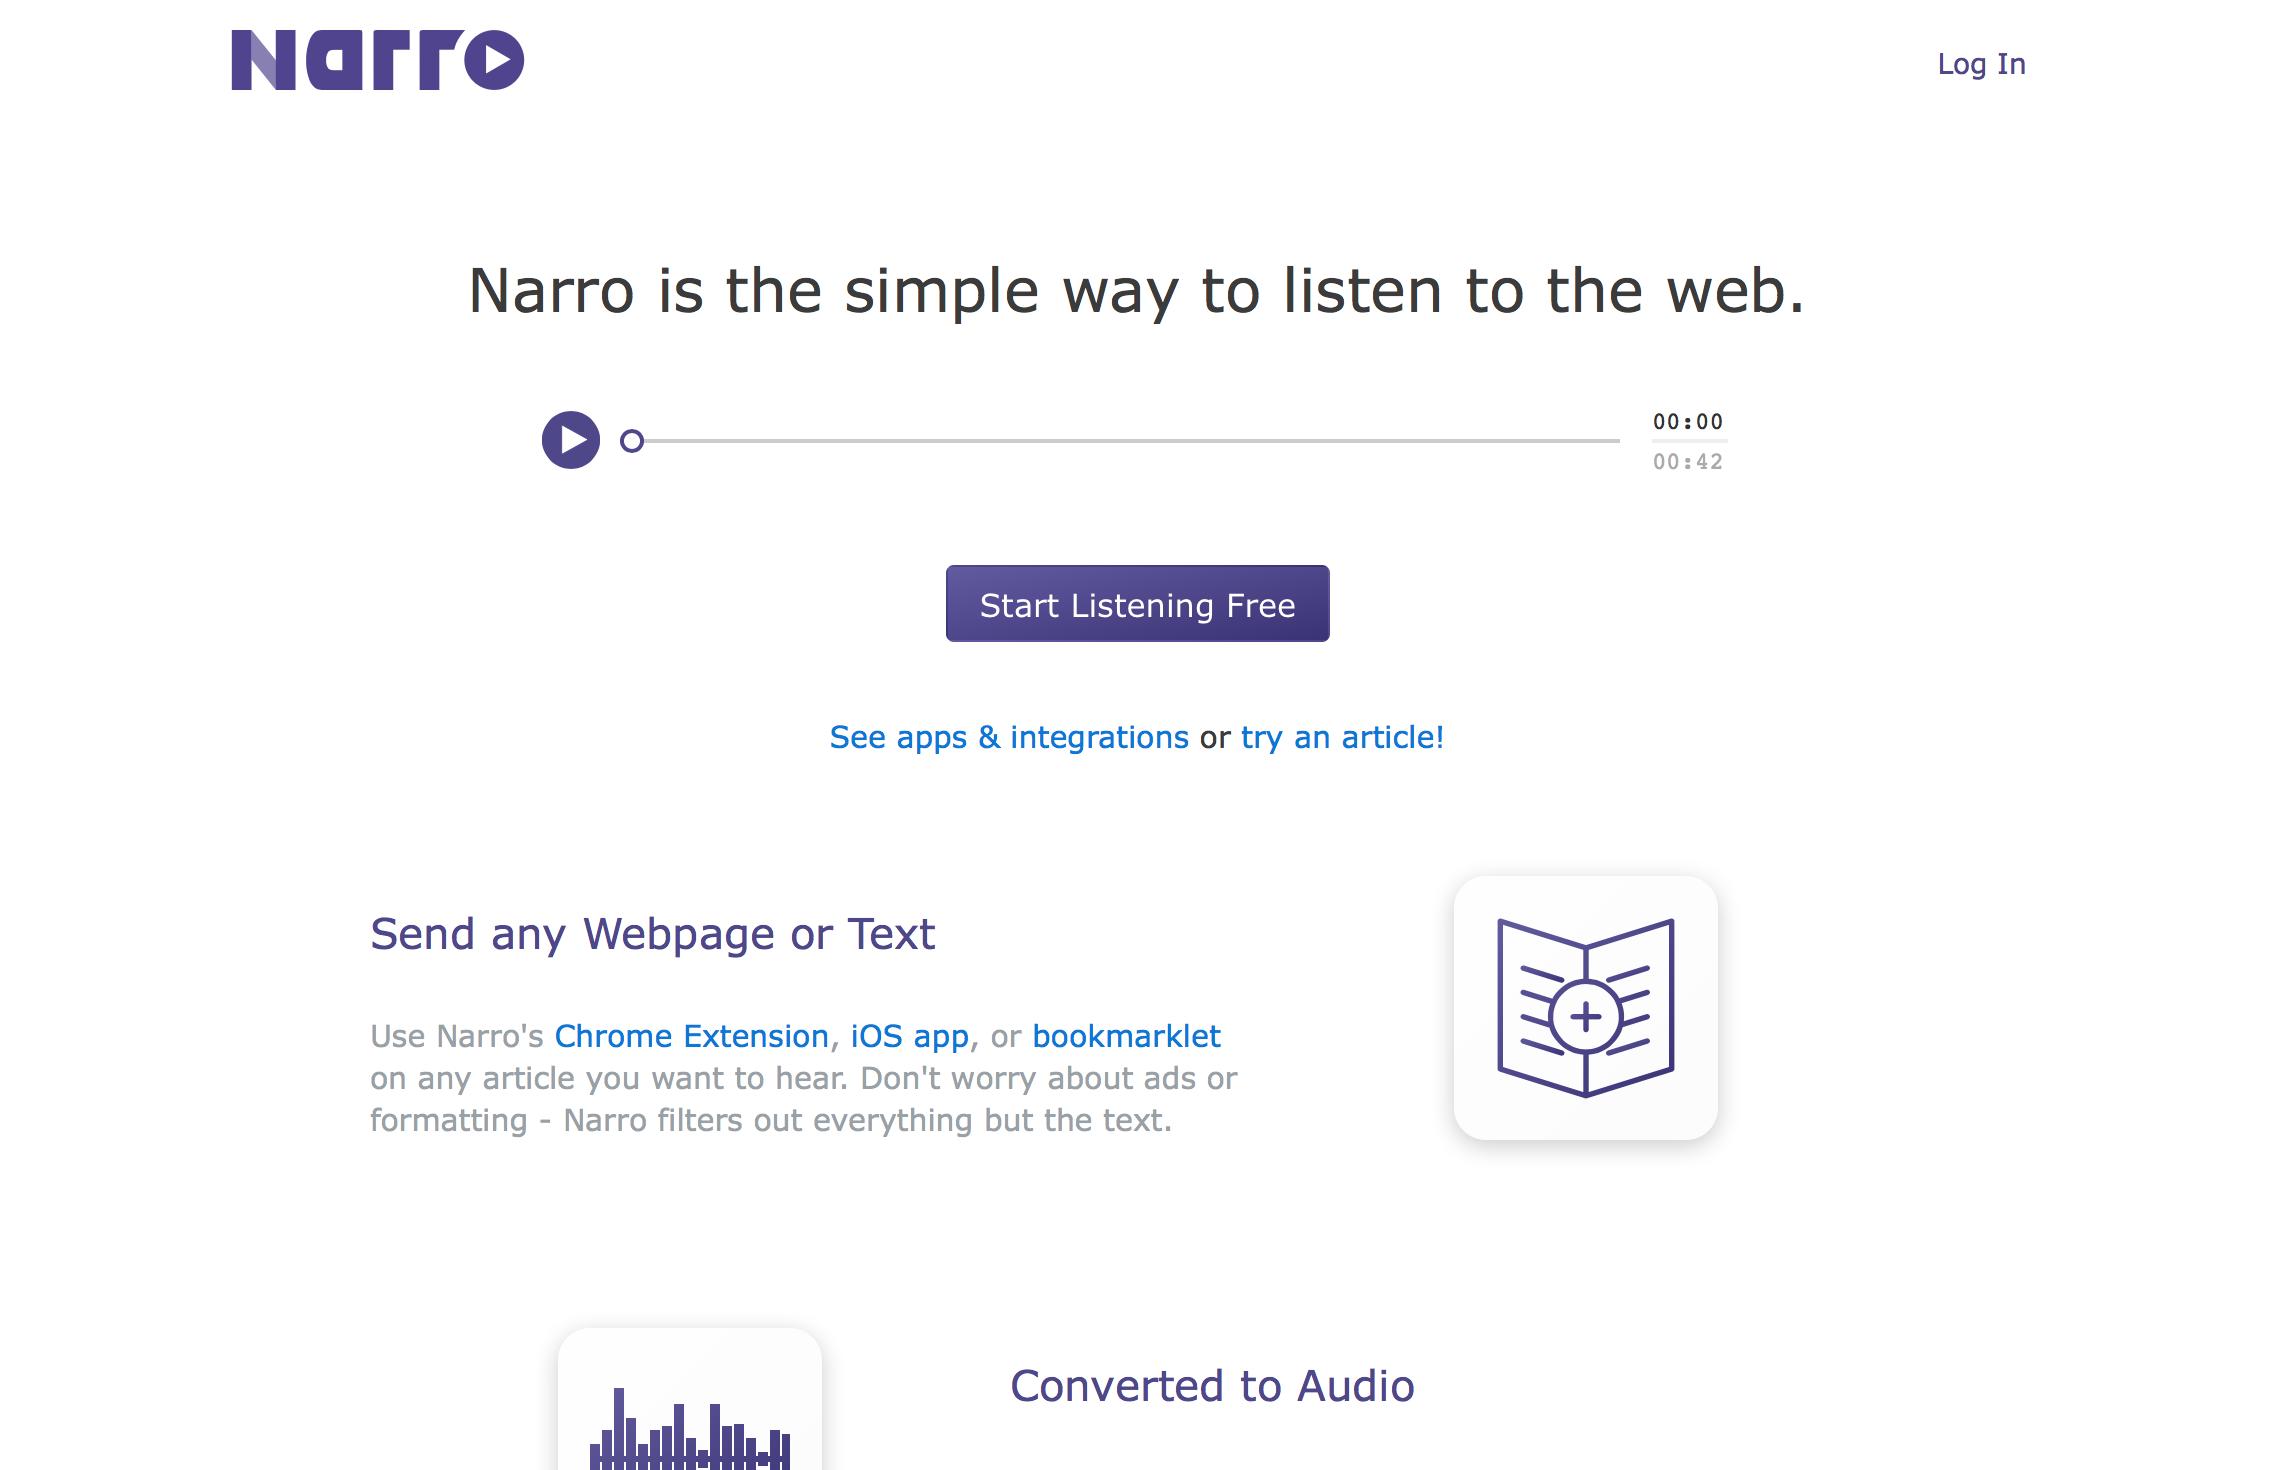 Imagen representativa de Narro.co